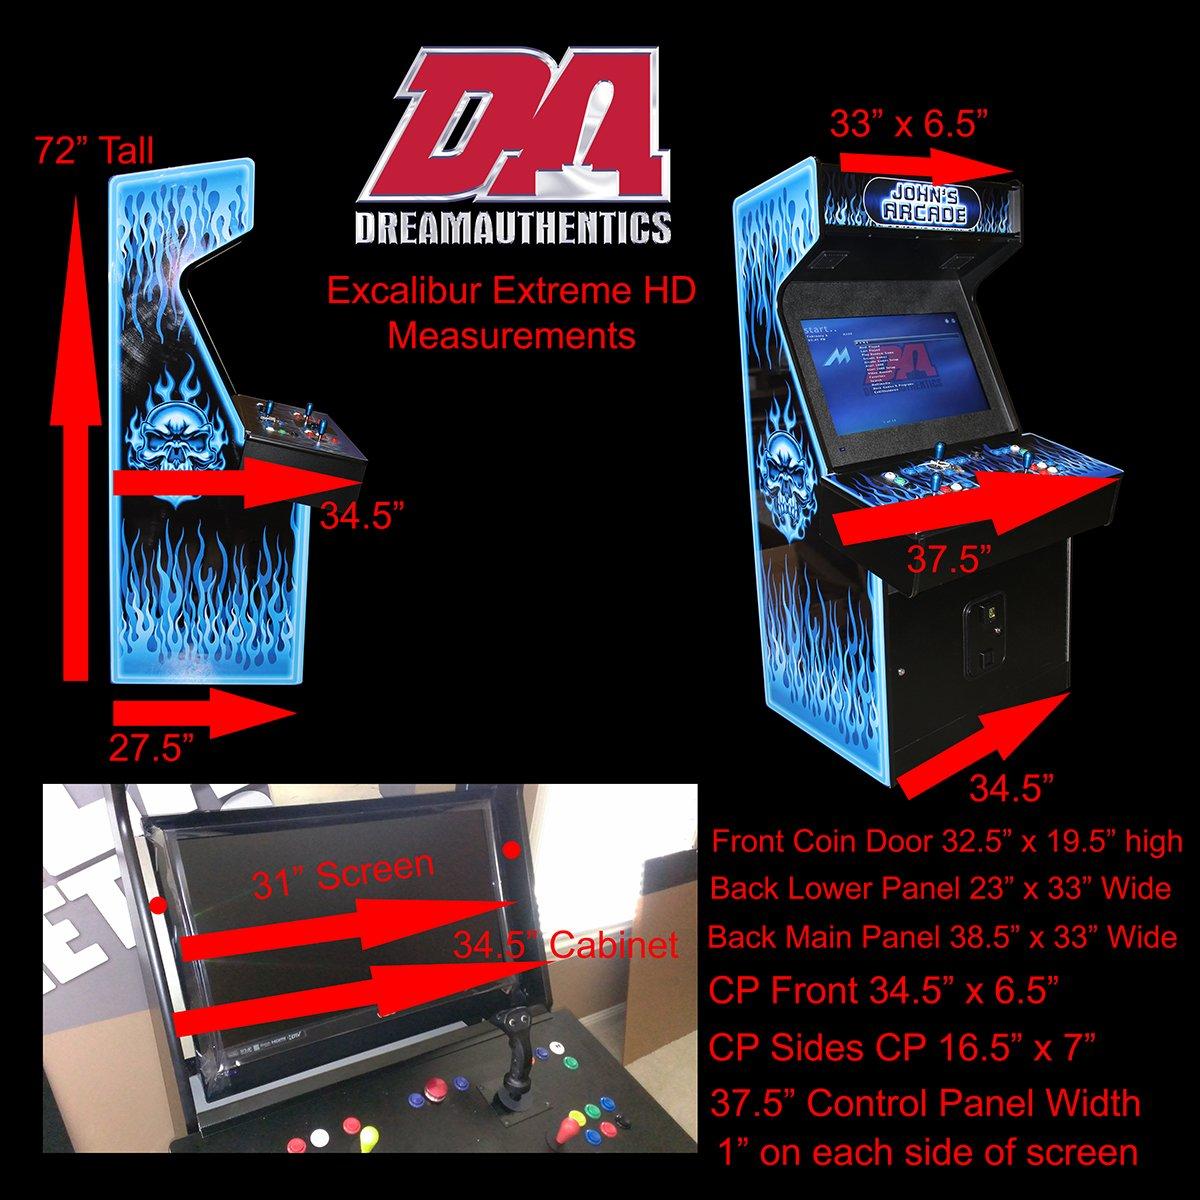 Arcade Games - ExcaliburHDmeasurements